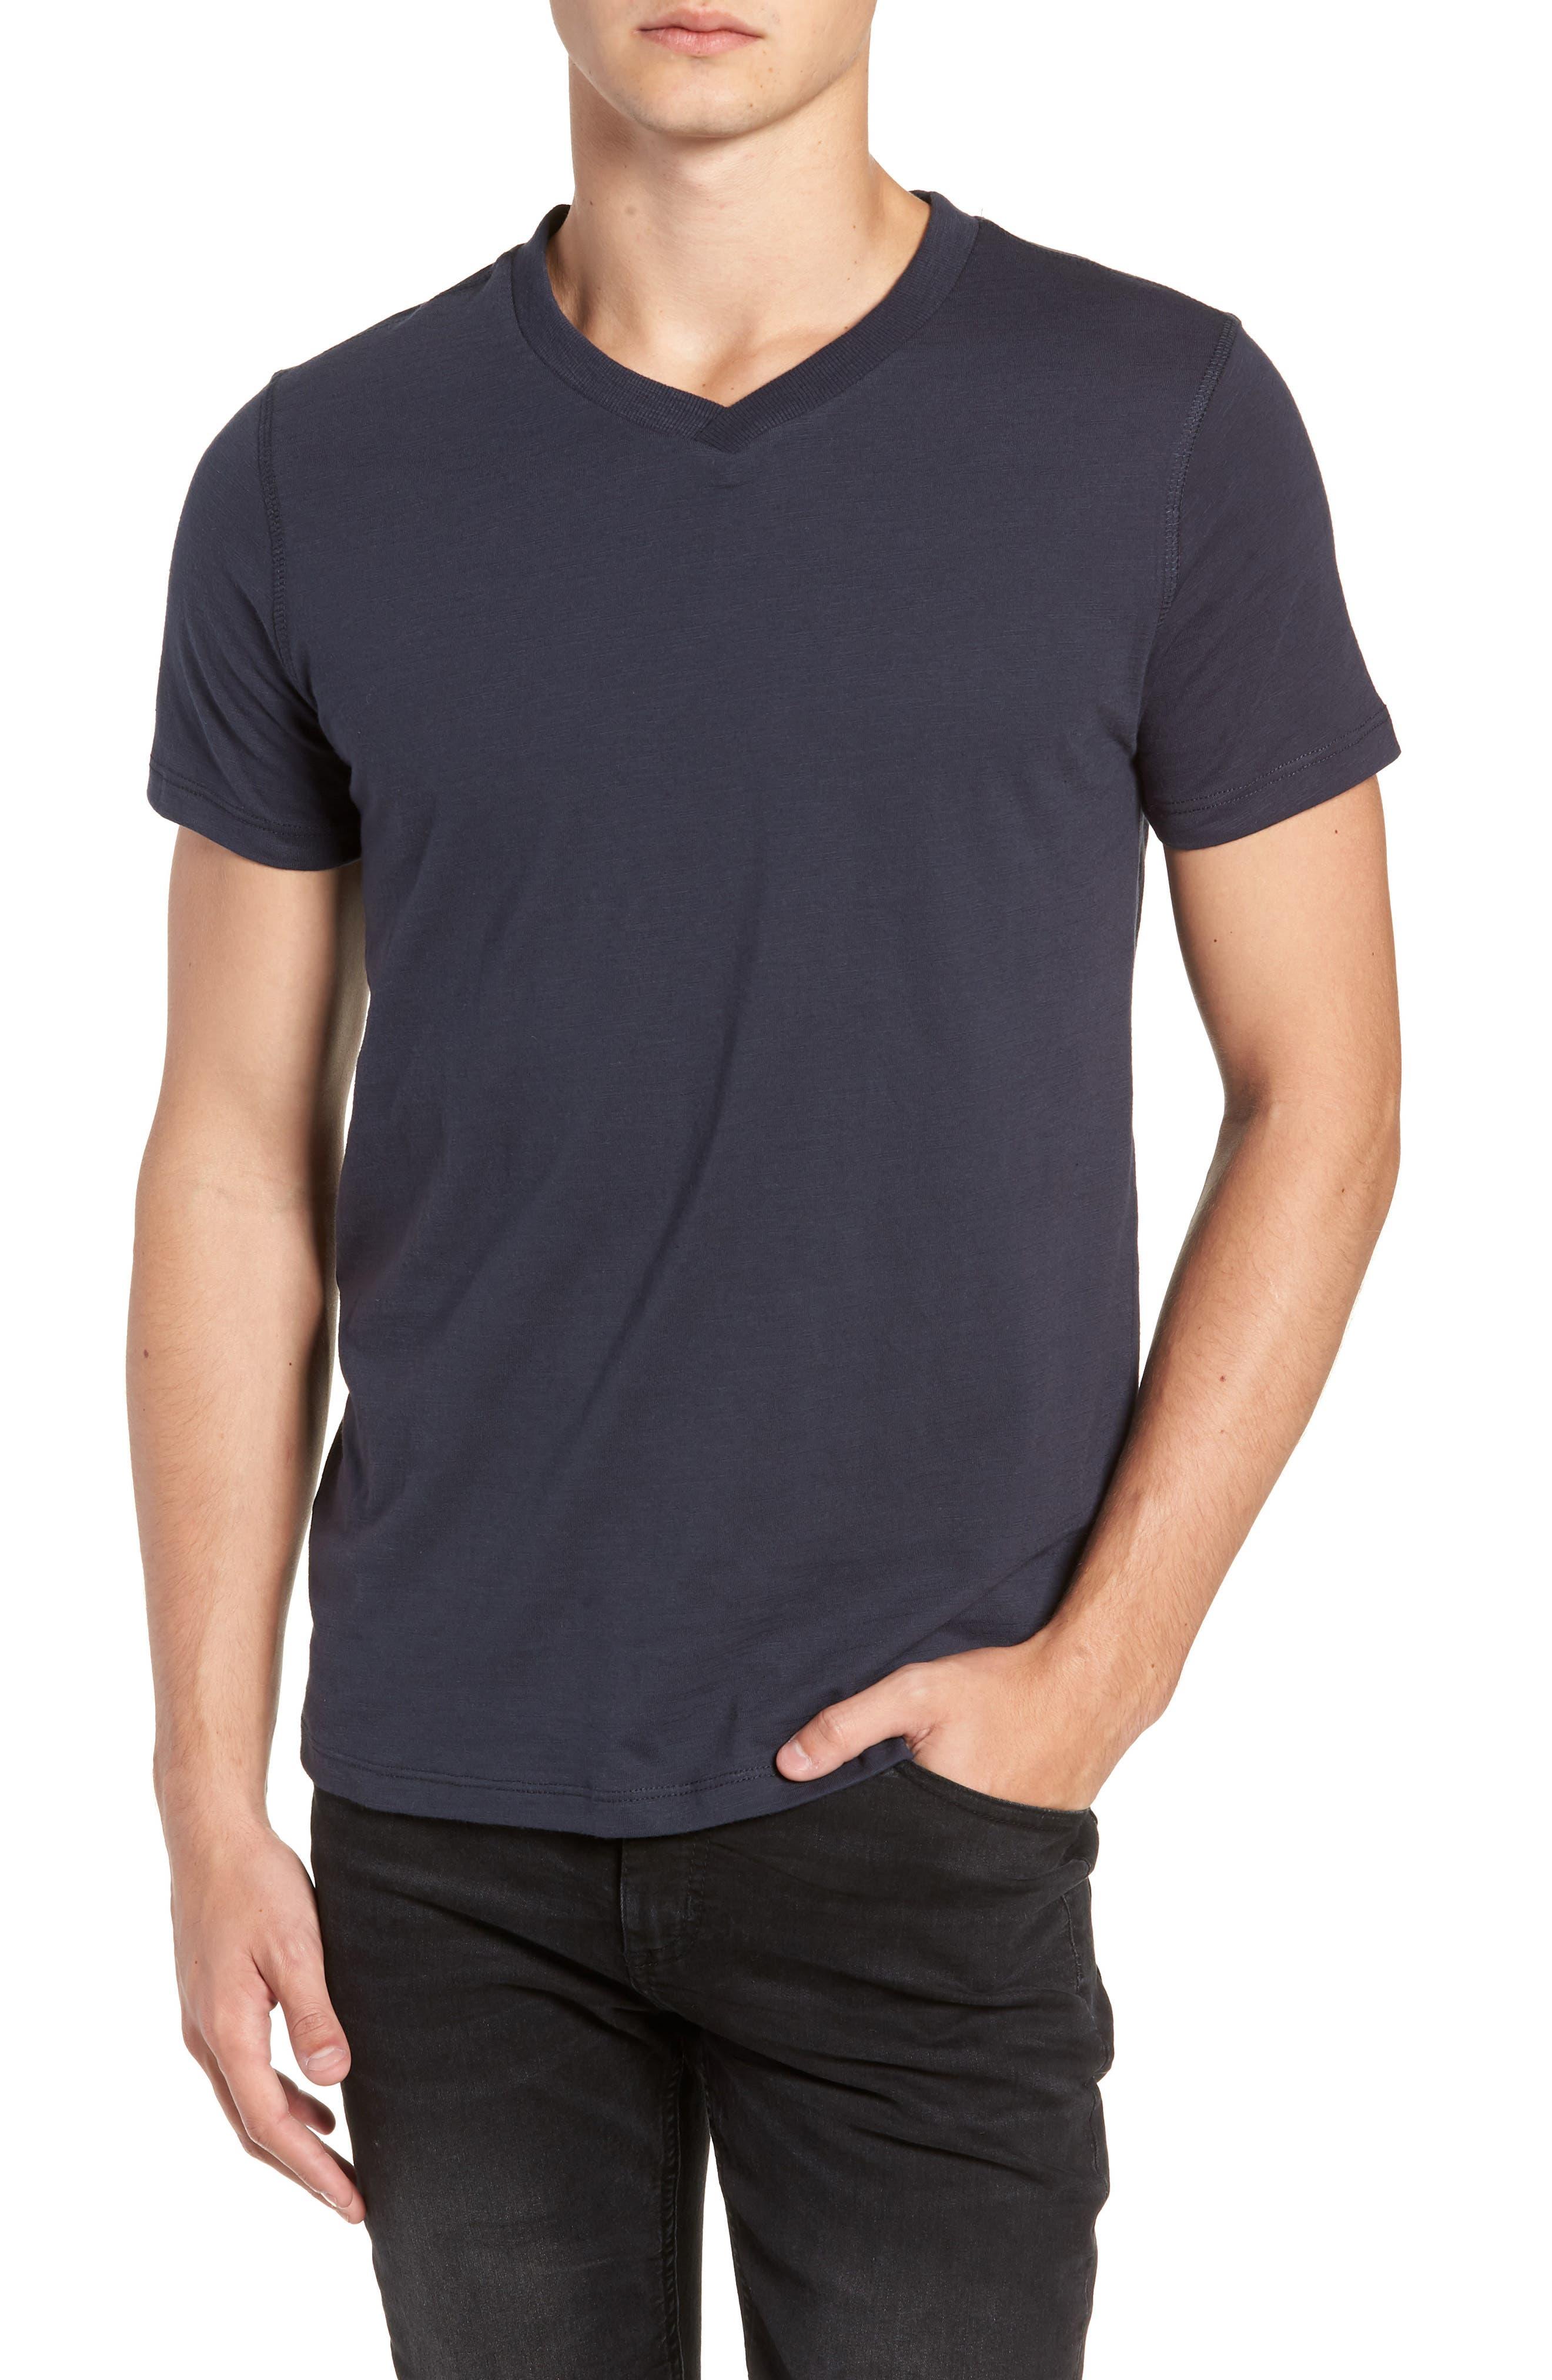 VESTIGE Soccer V-Neck T-Shirt in Carbon